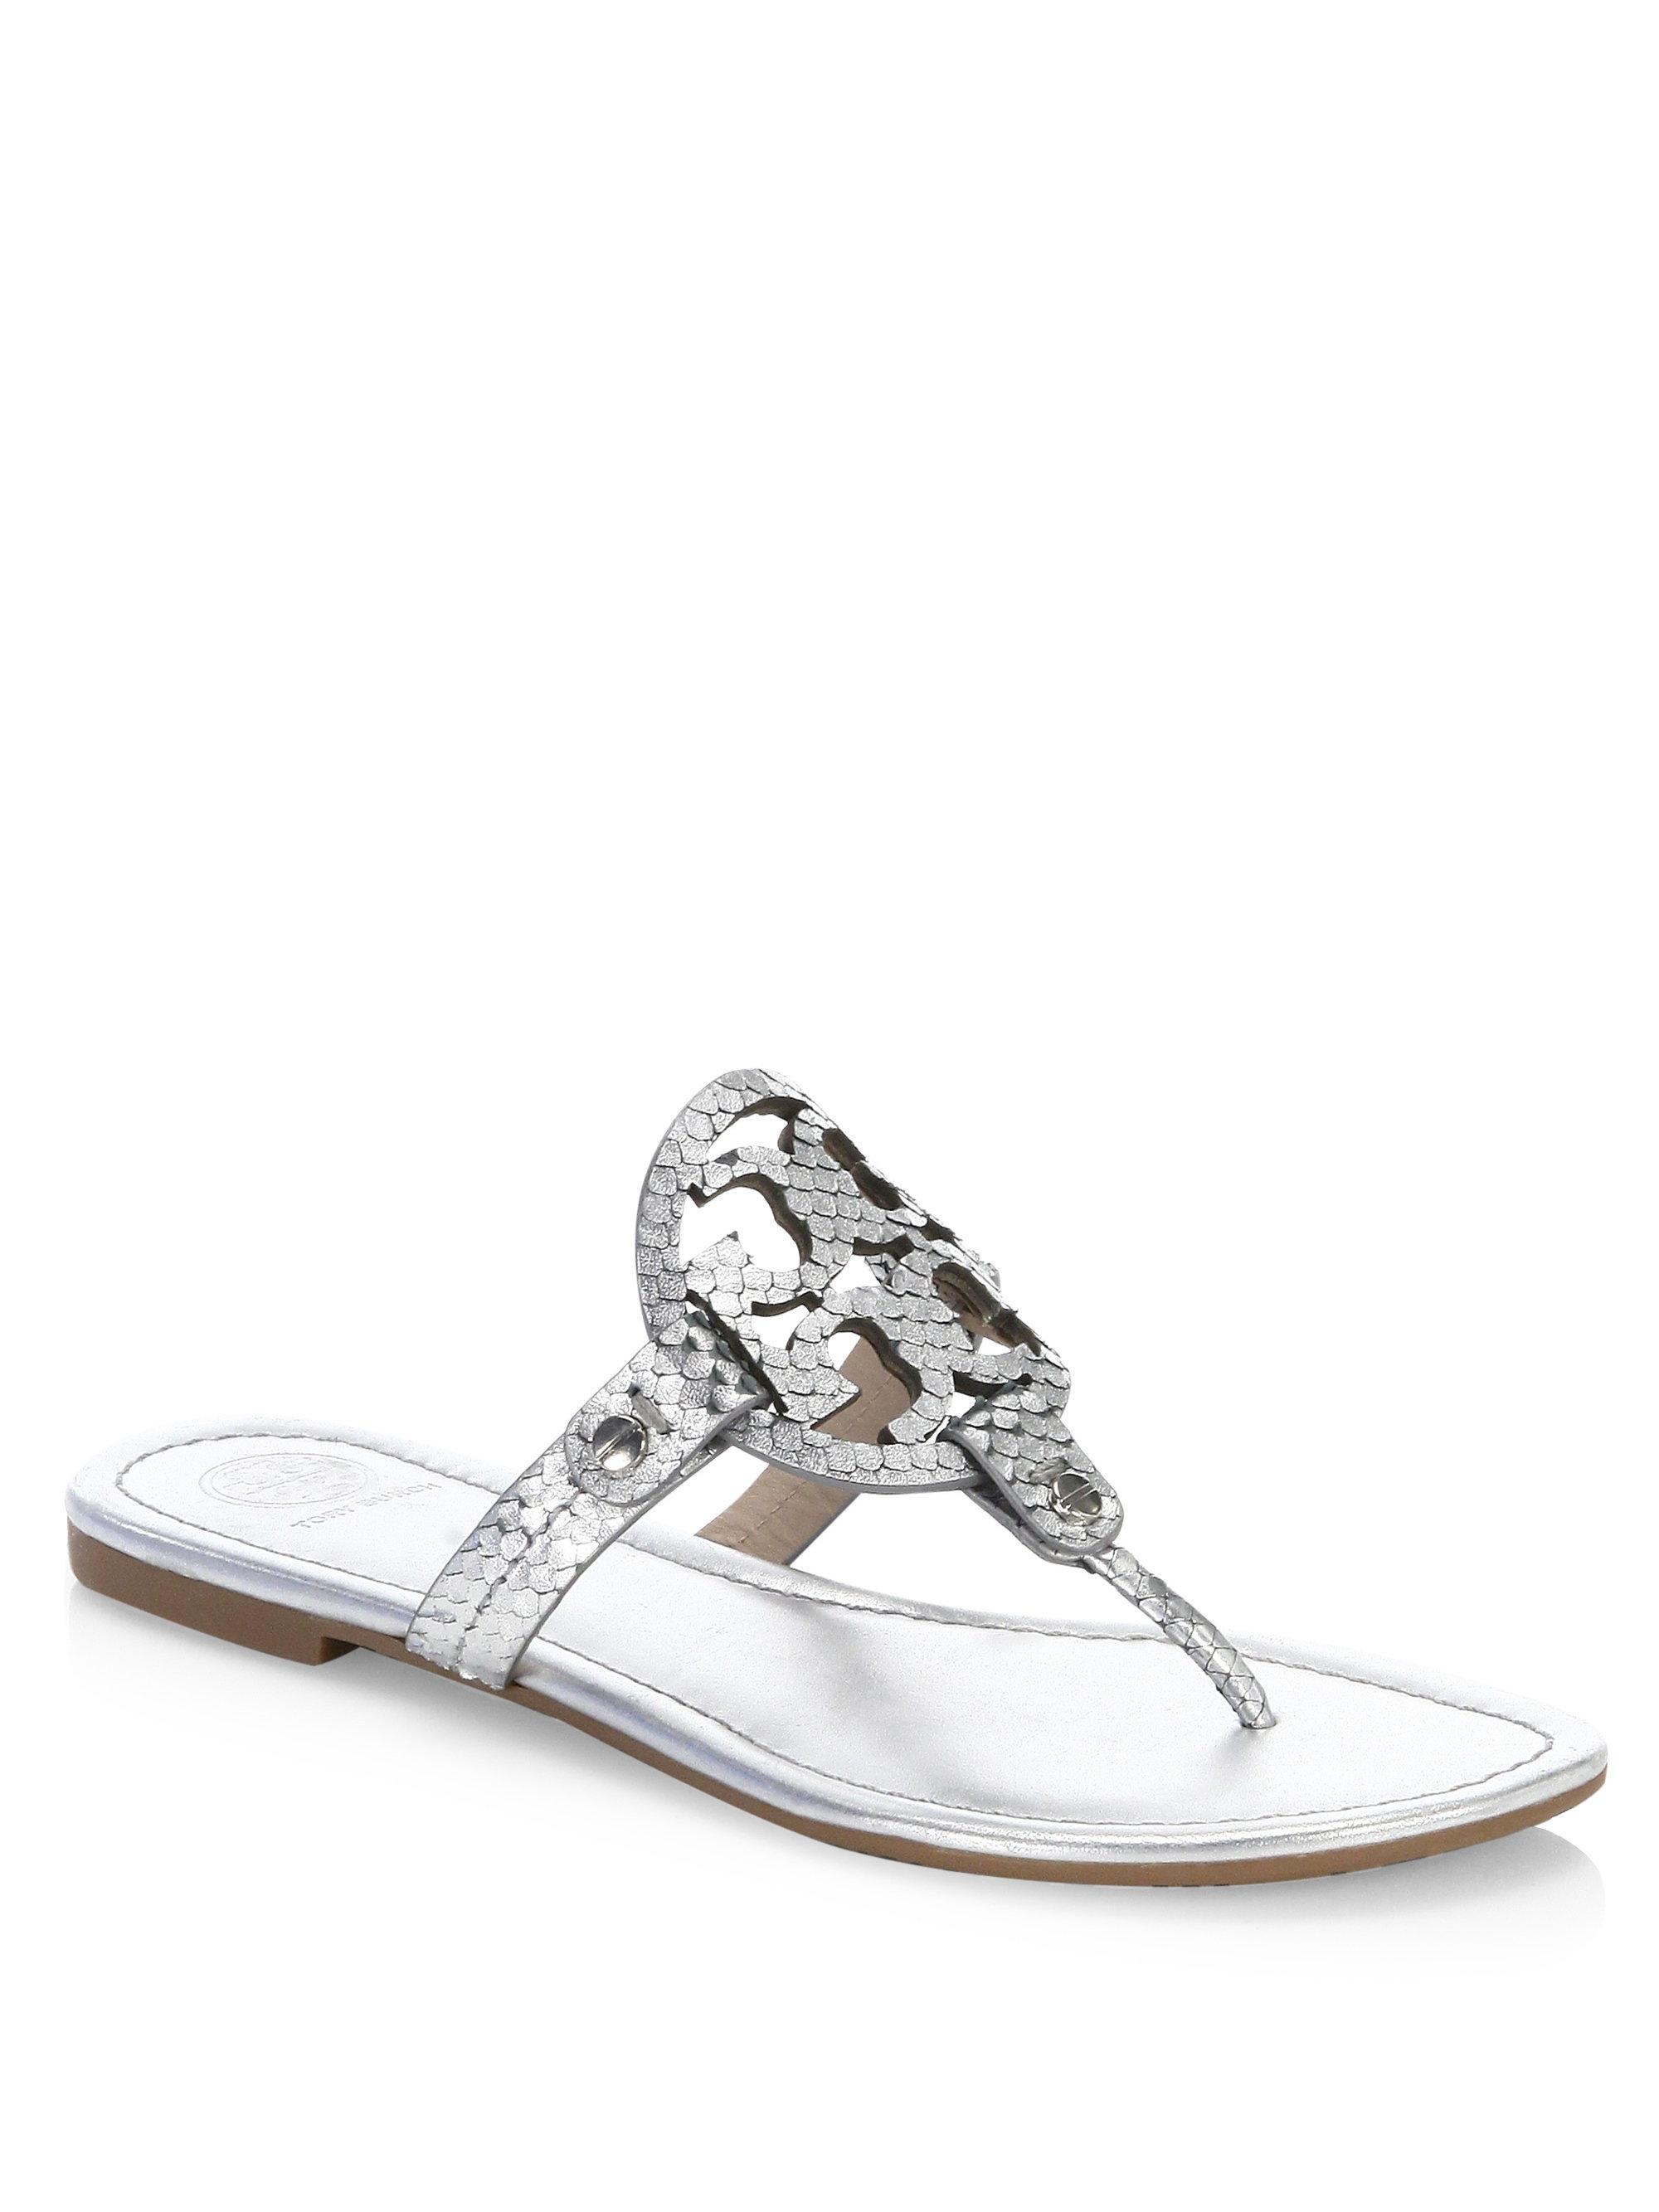 d343760ca2ebe Tory Burch - Metallic Miller Leather Thong Sandals - Lyst. View fullscreen